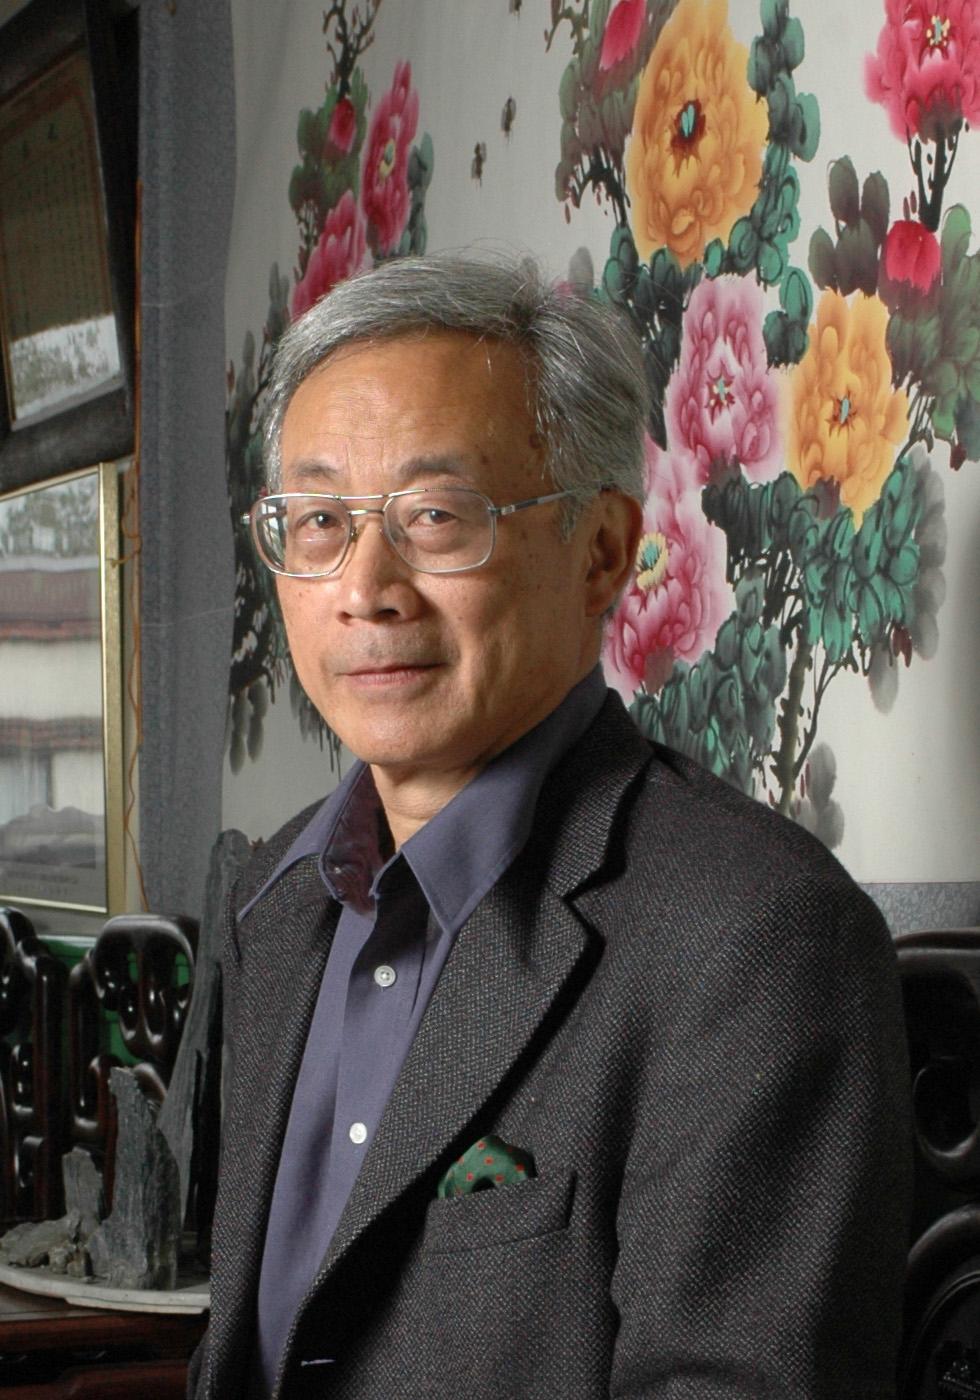 Joe Wai...seasoned practitioner